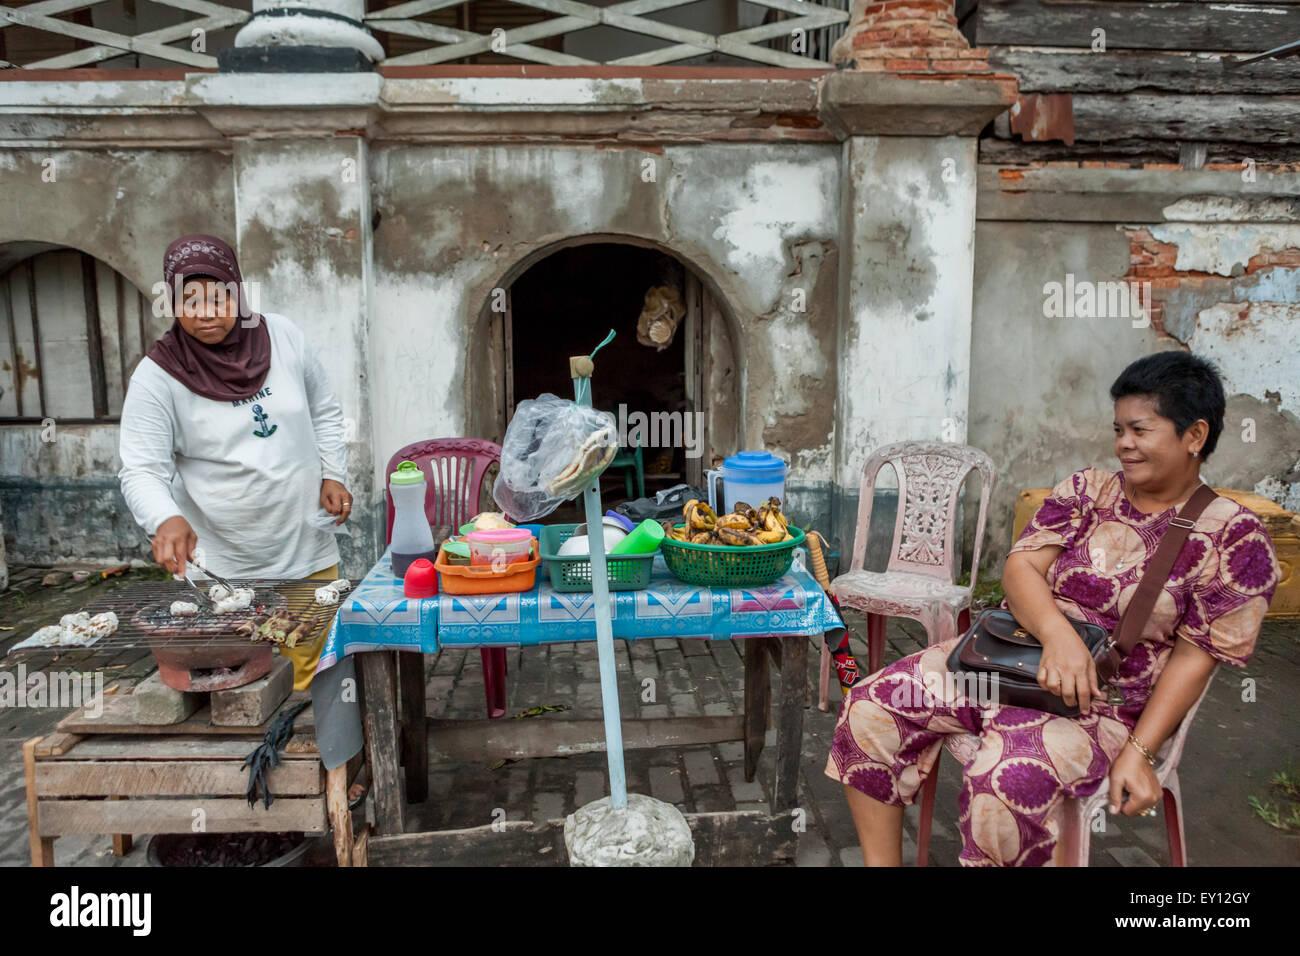 Street food vendor at Palembang, Sumatra, Indonesia. - Stock Image